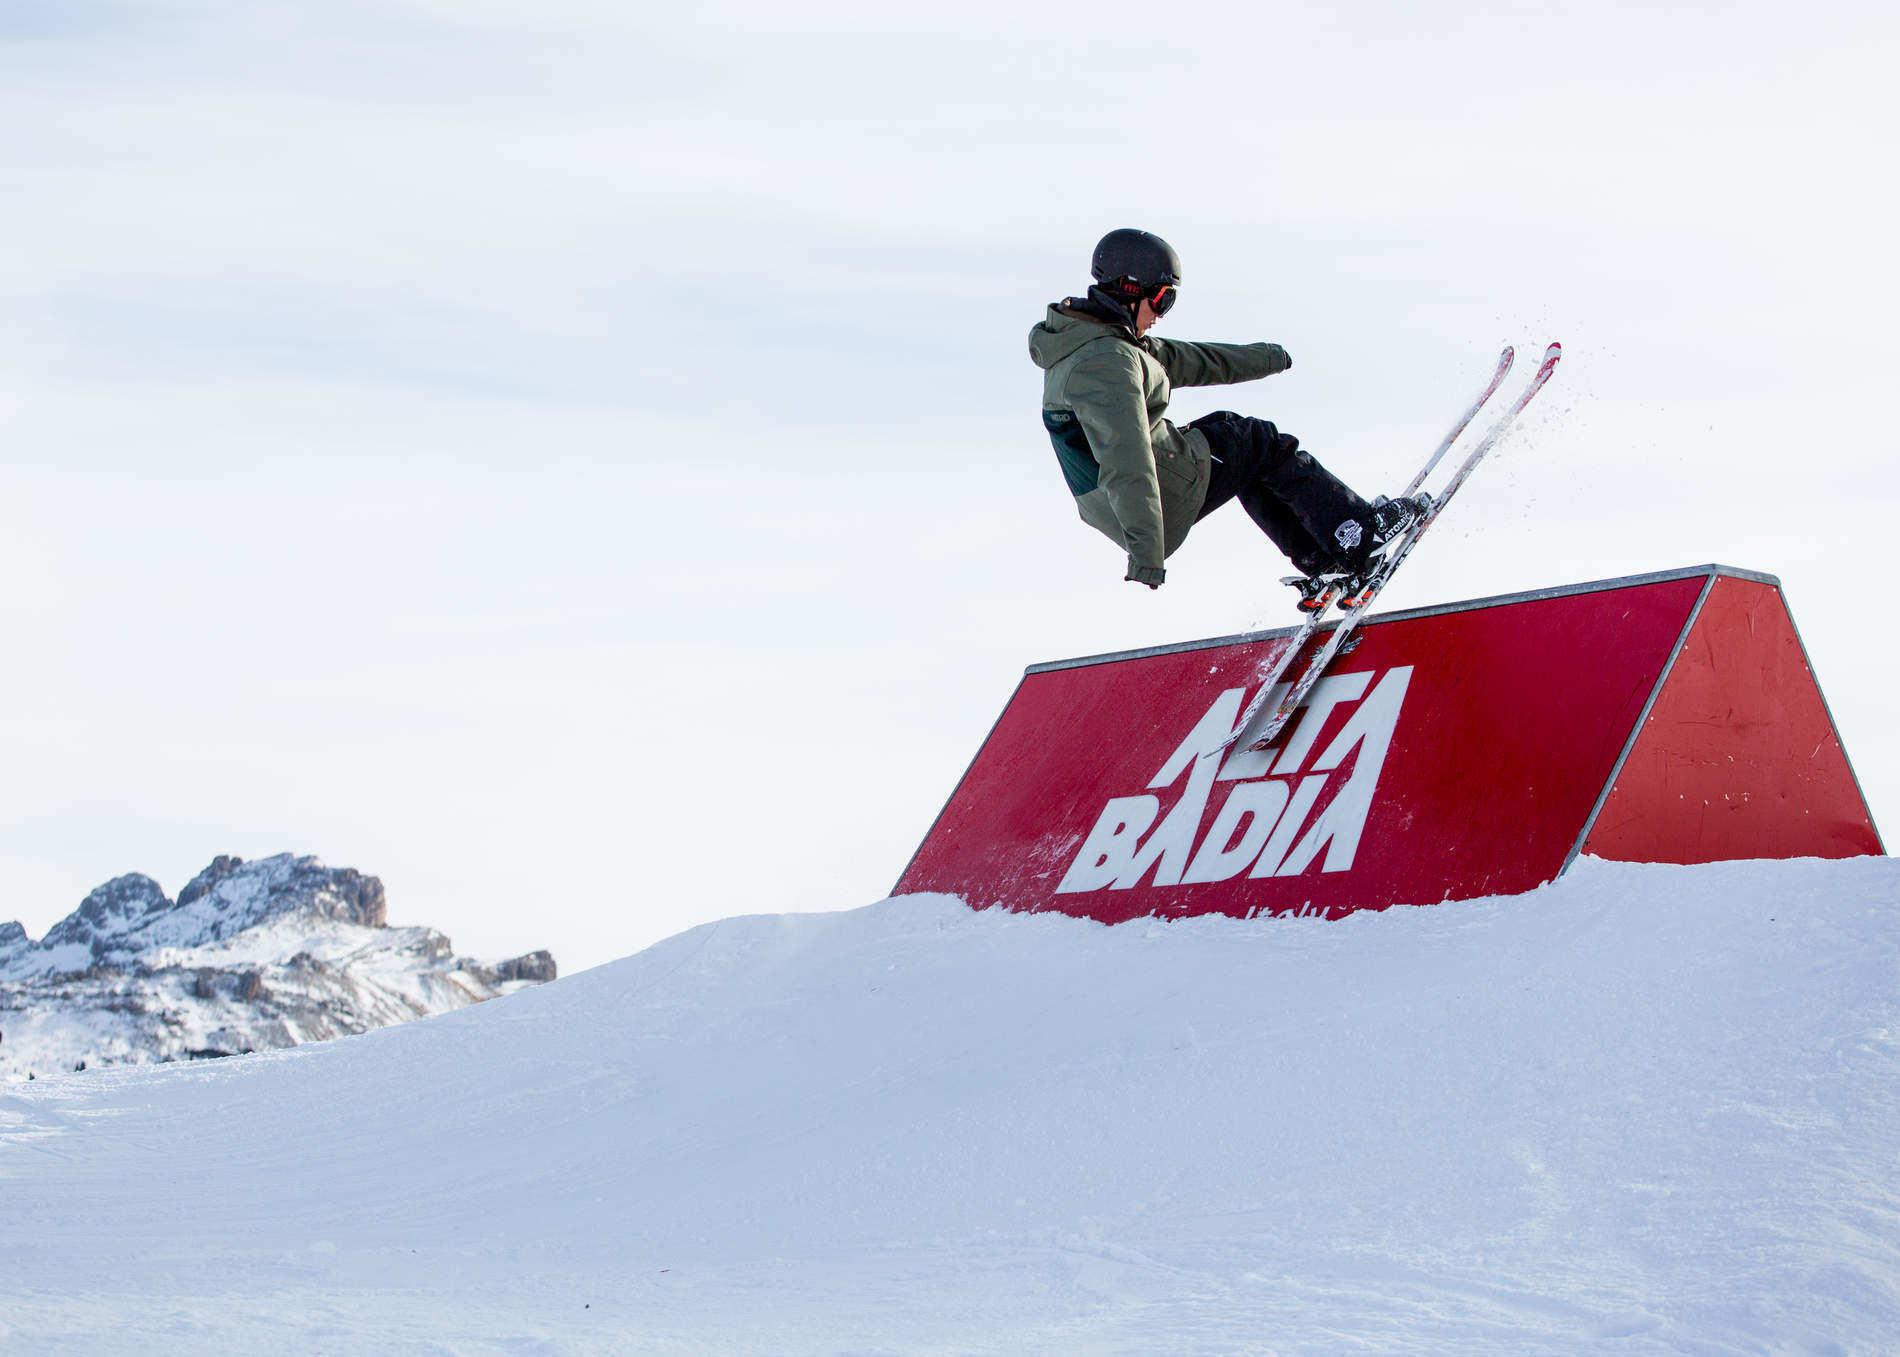 Pirates Territory – Two Generations of Freestyle Pirates at Snowpark Alta Badia